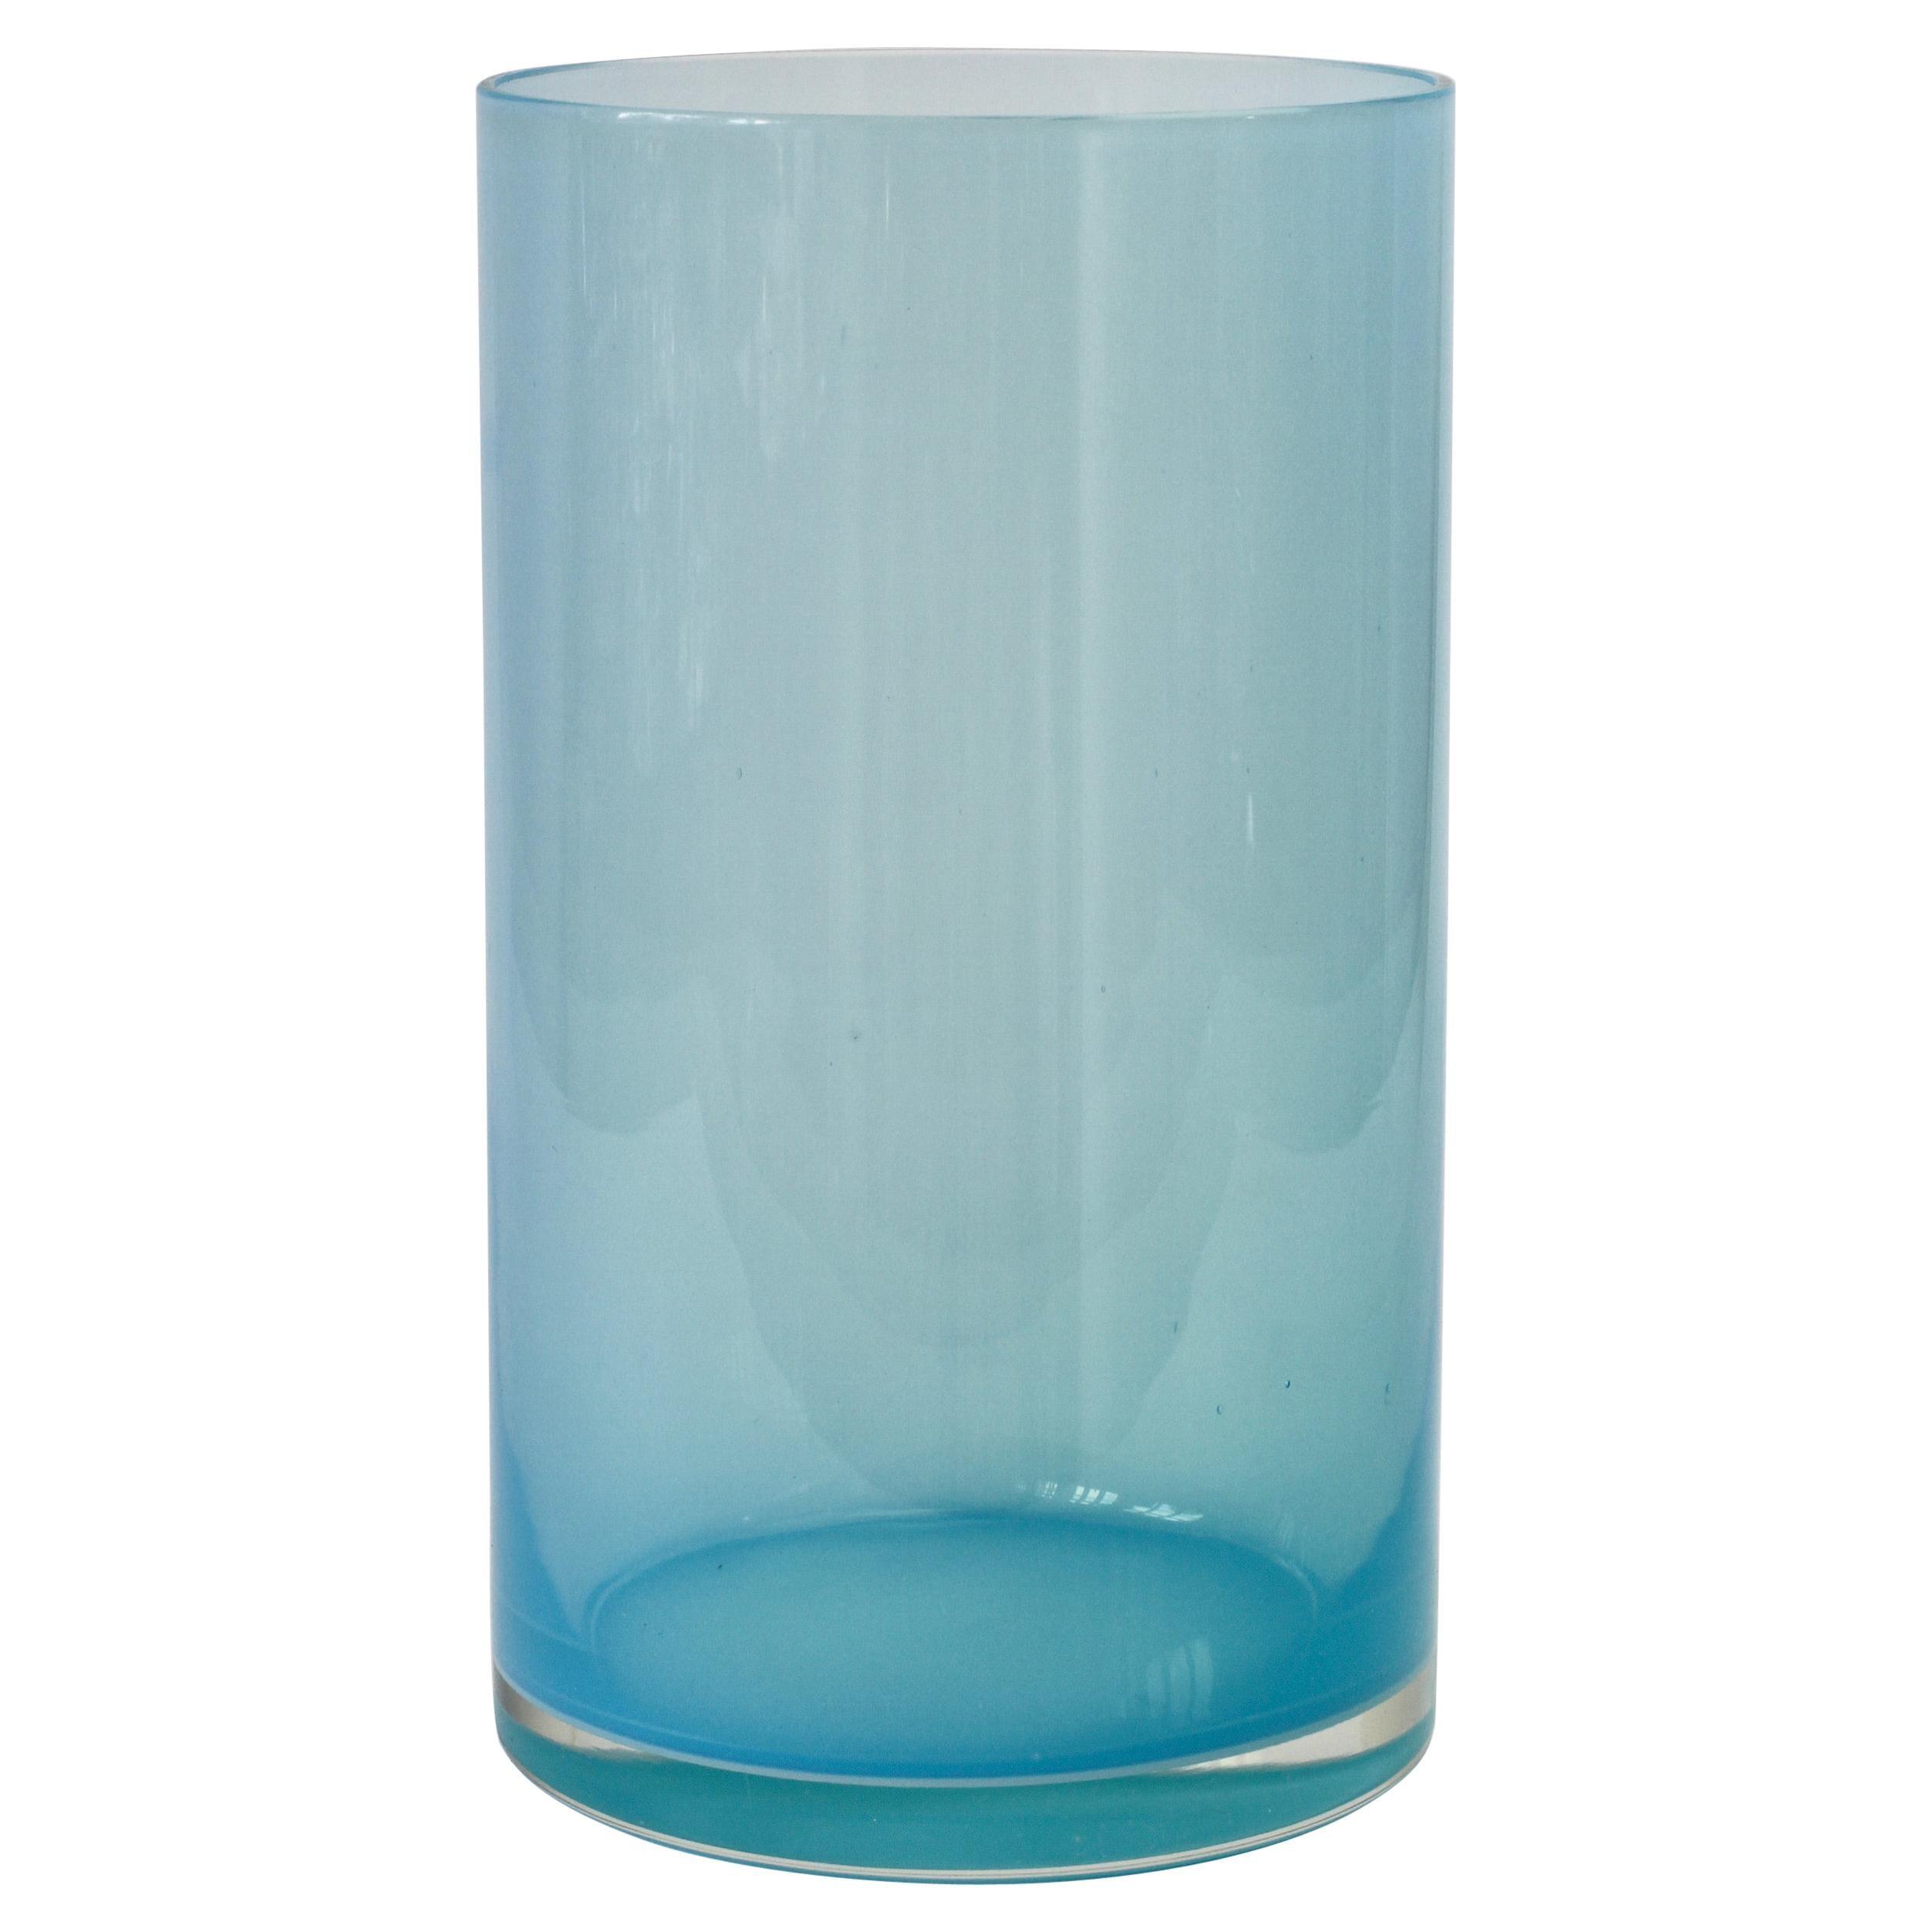 Signed Antonio da Ros for Cenedese Vibrantly Colored Murano Glass Vase